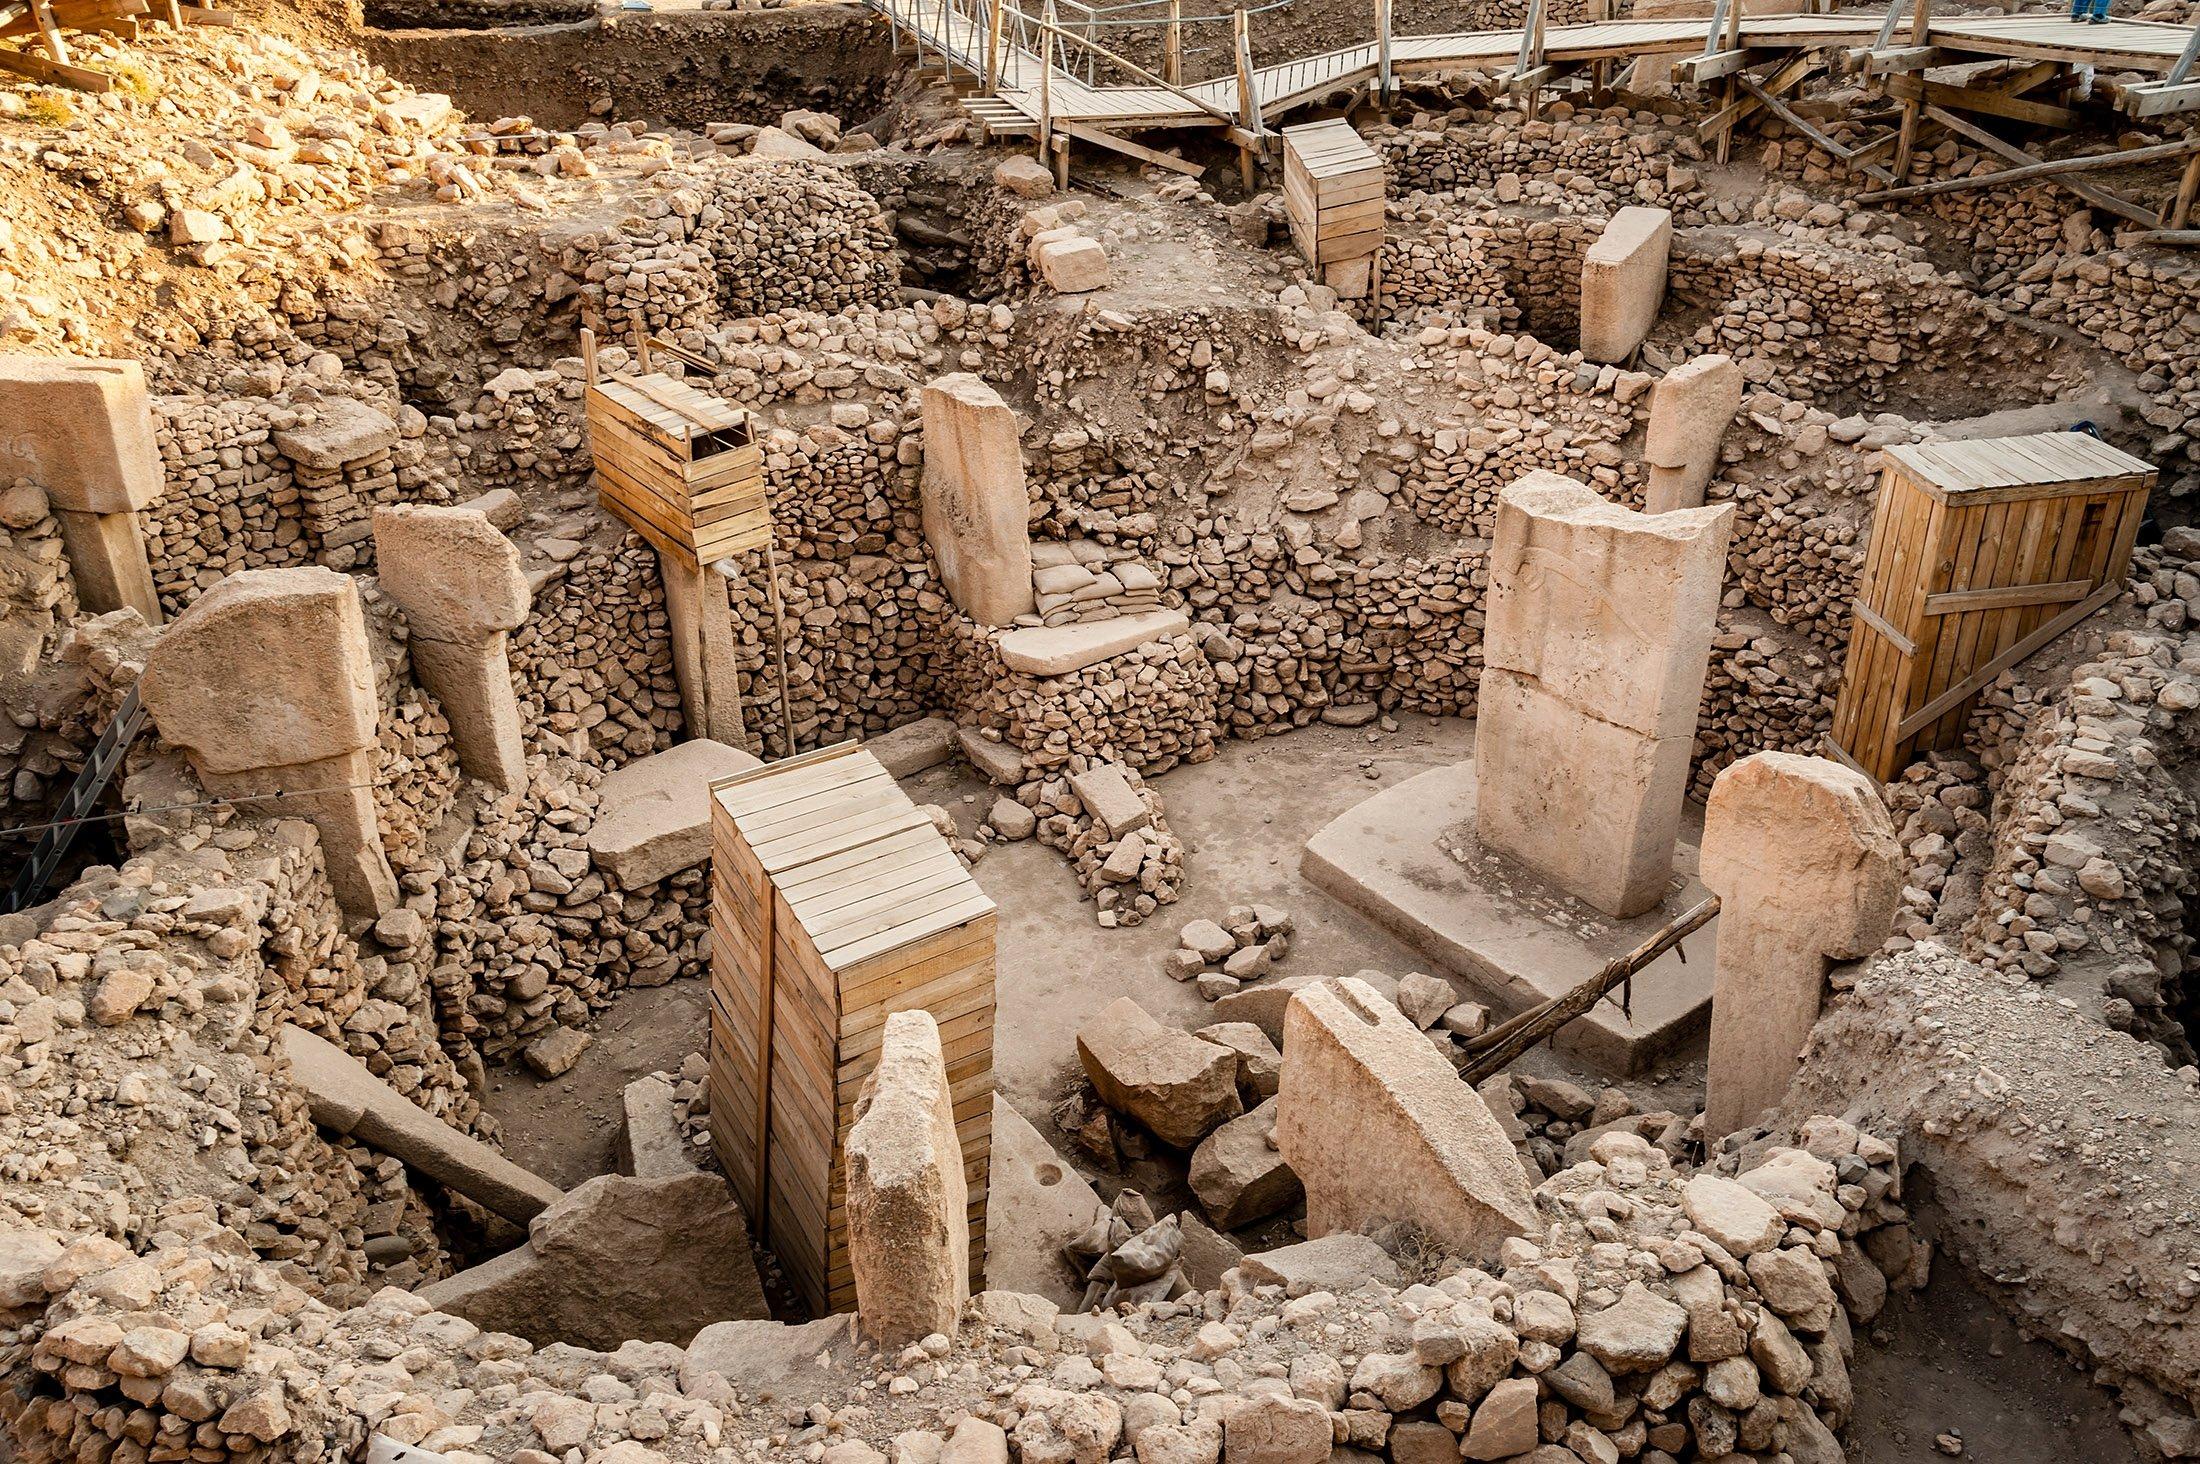 The outstanding 12,000-year-old Göbeklitepe complex, near Şanlıurfa, Turkey. (Shutterstock Photo)